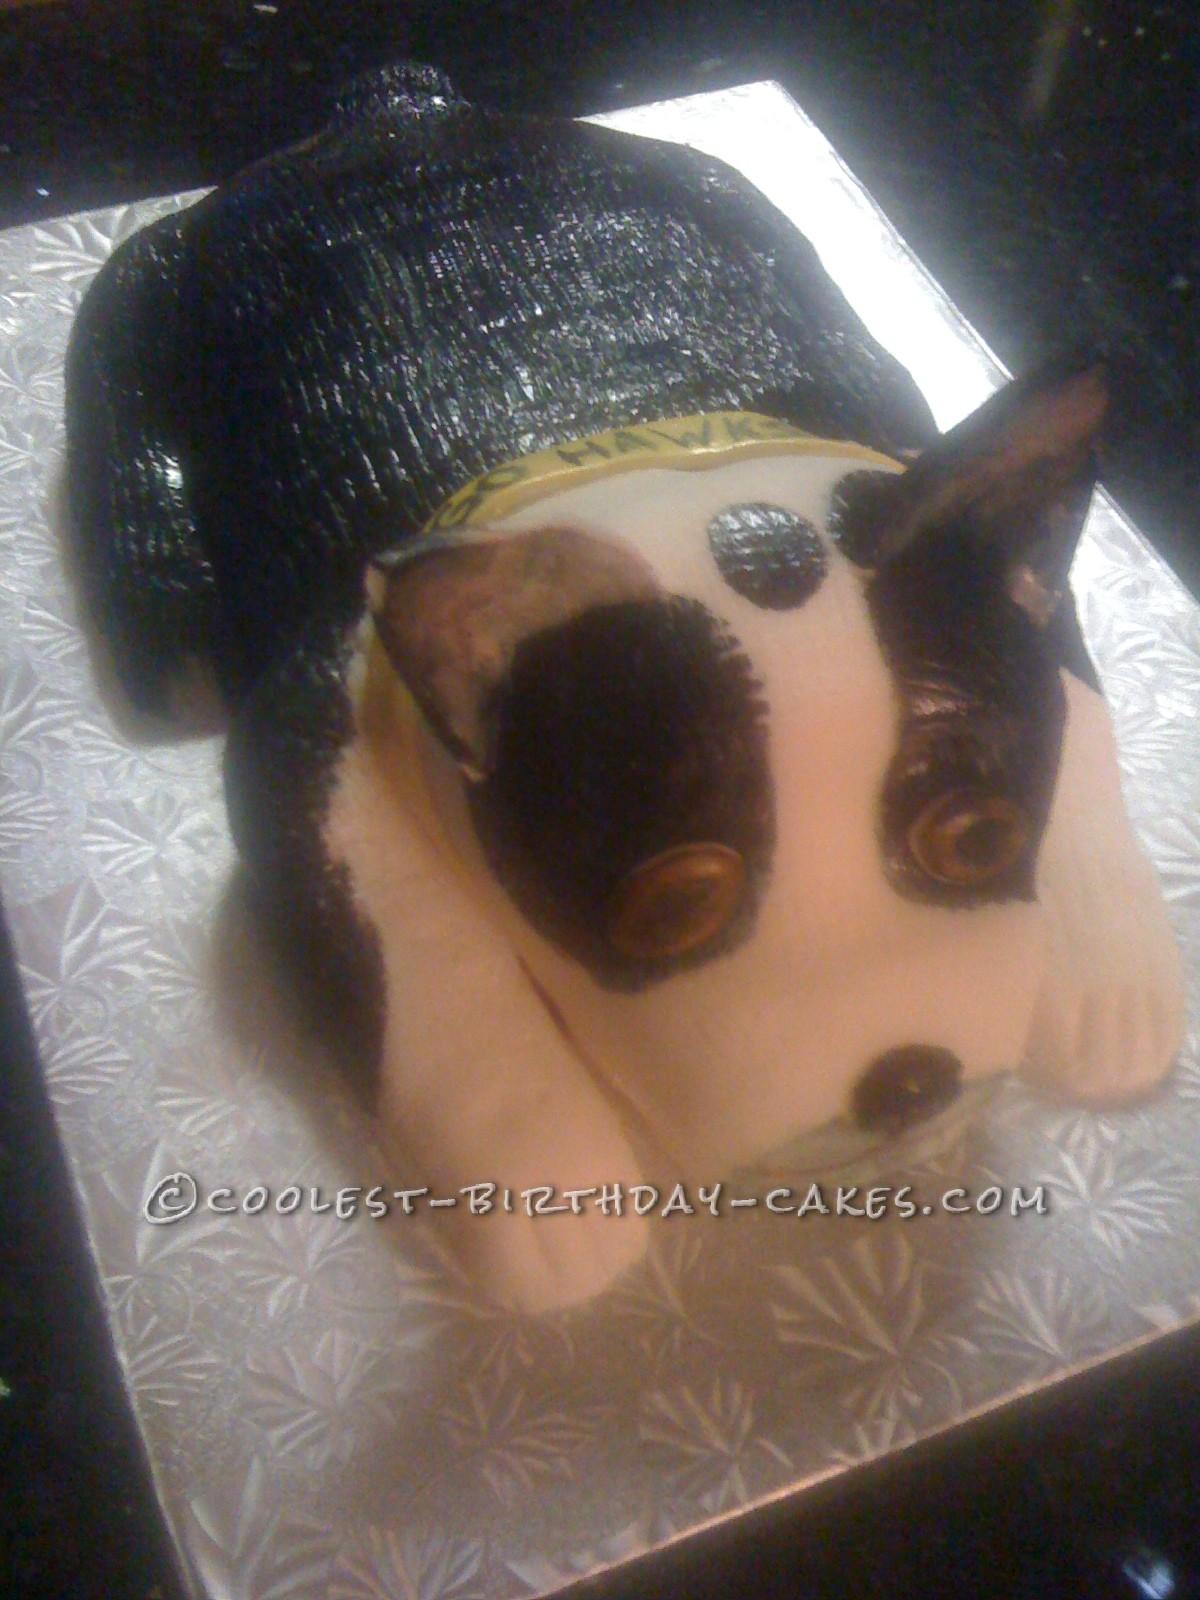 Man's Best Friend-Or My Husband's Best Friend Dog Cake